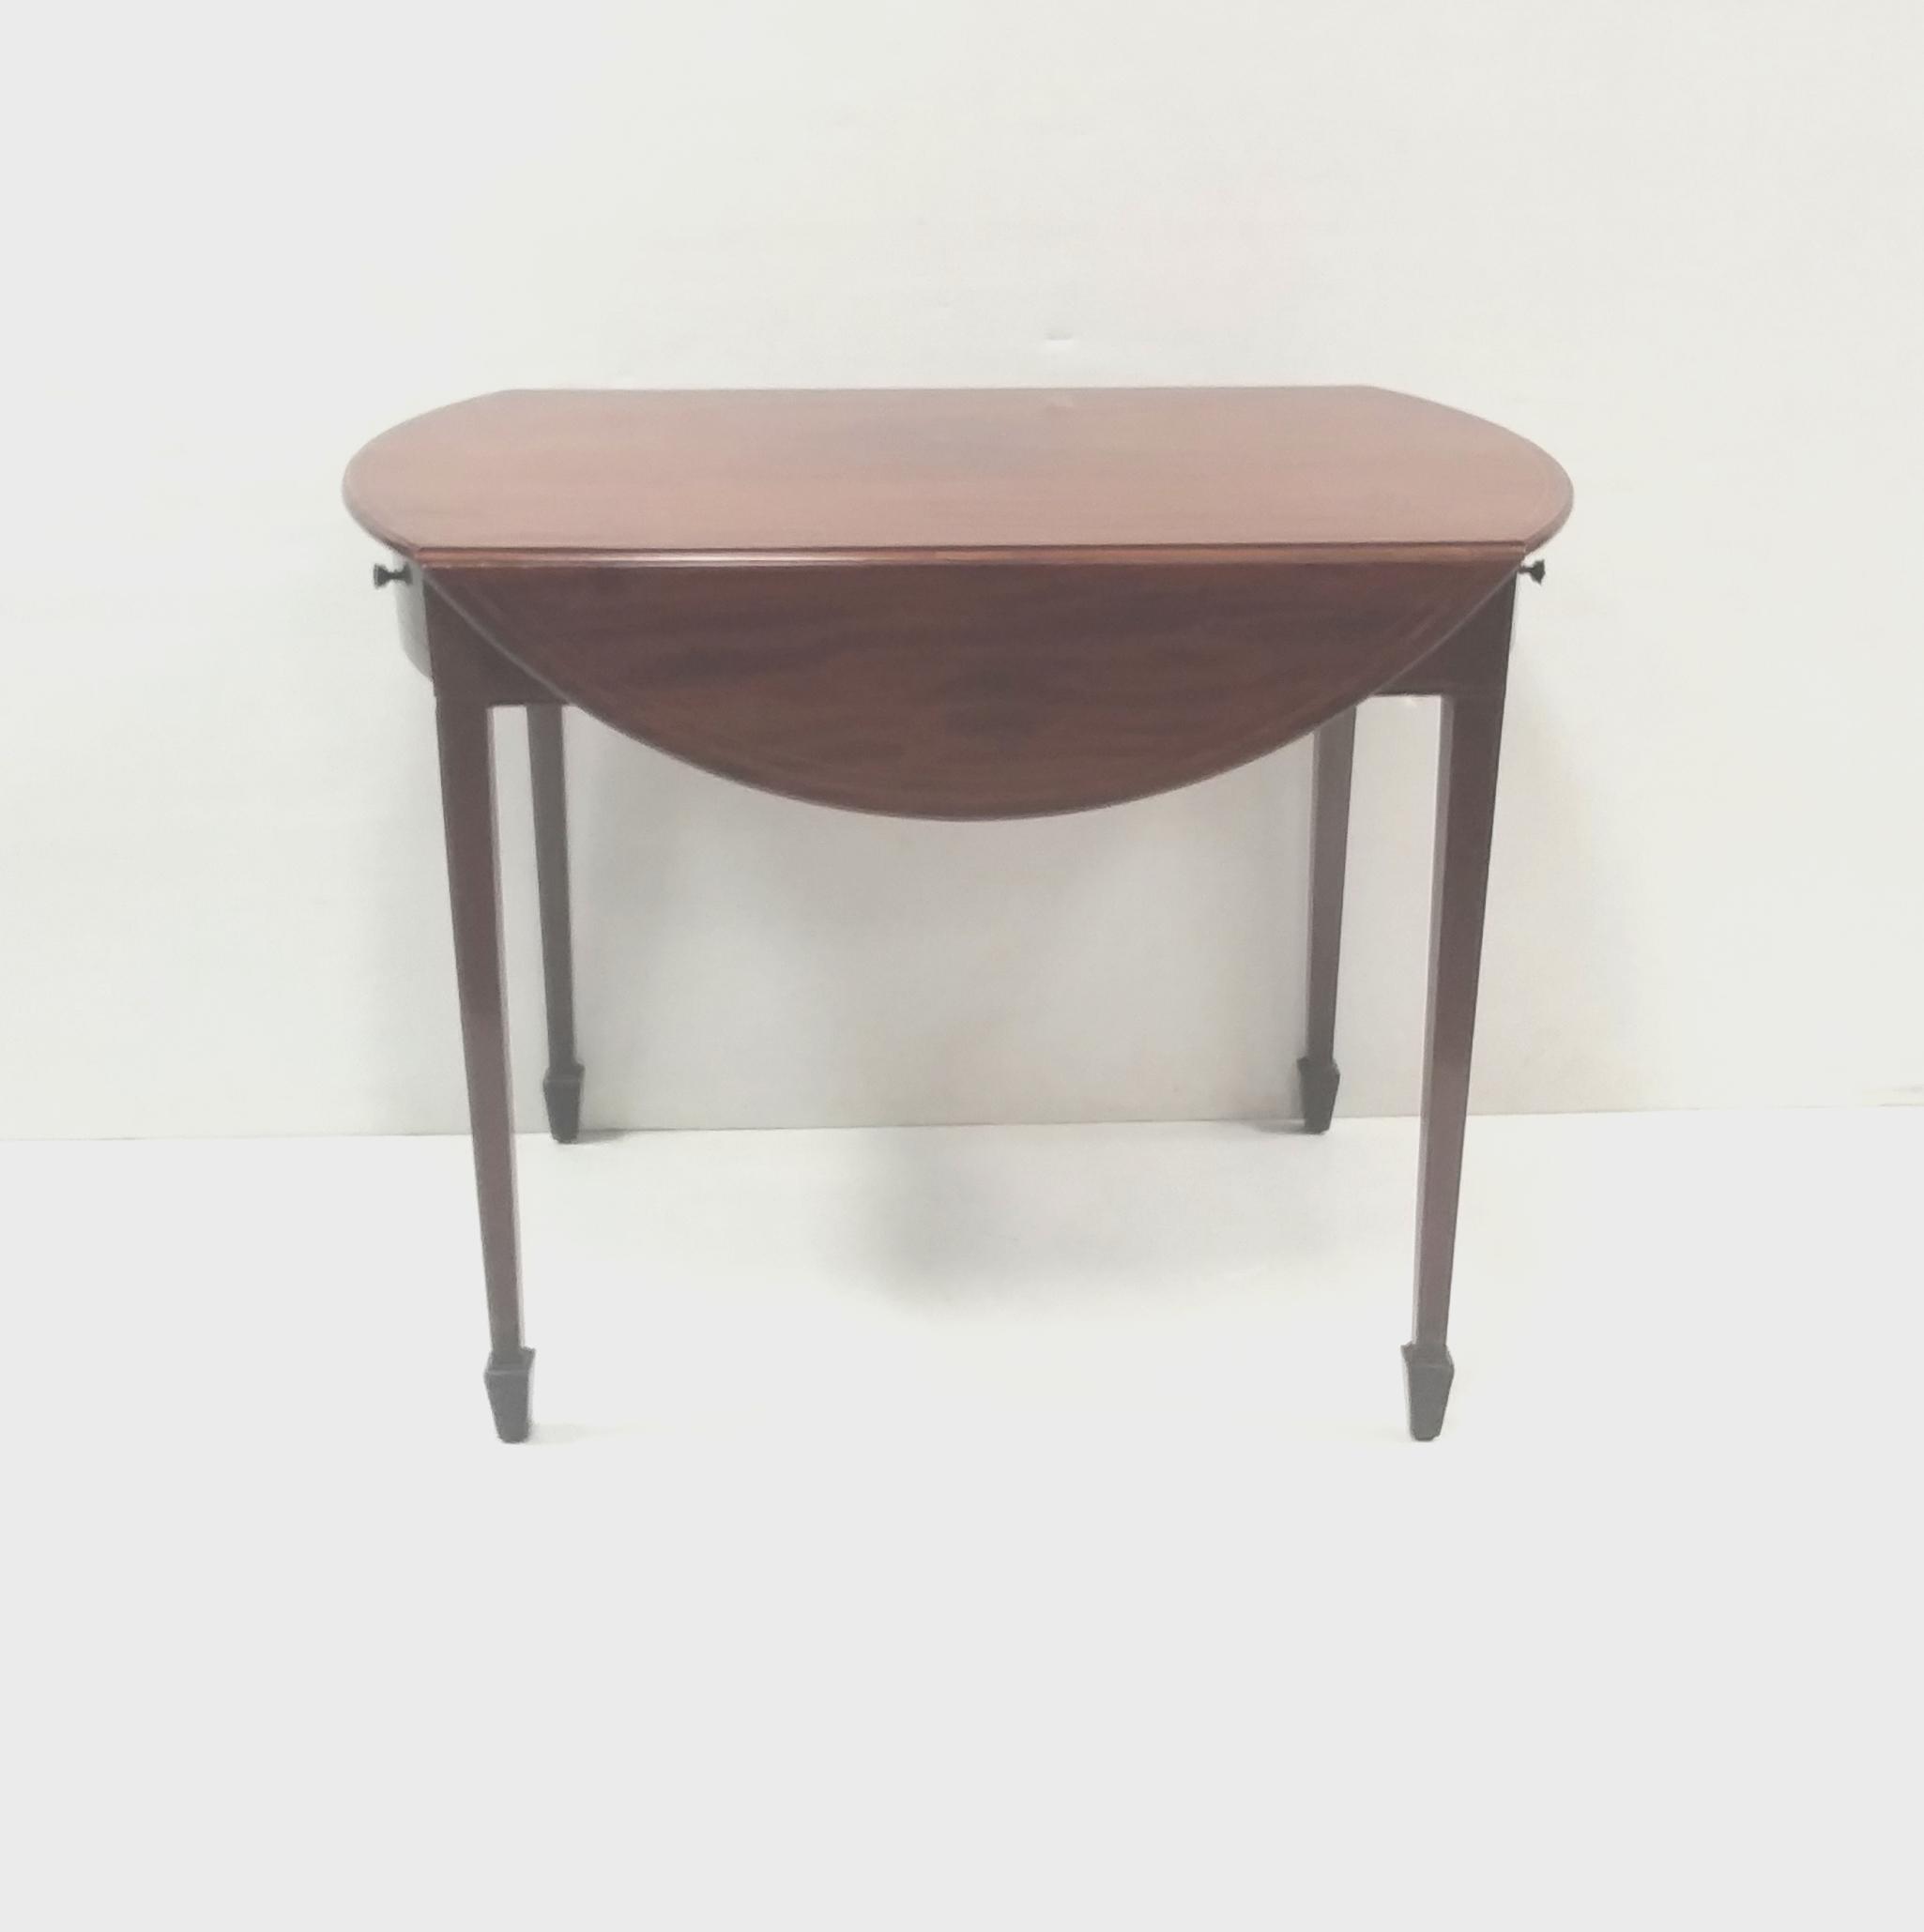 Antique_Edwardian_Drop_Leaf_Table